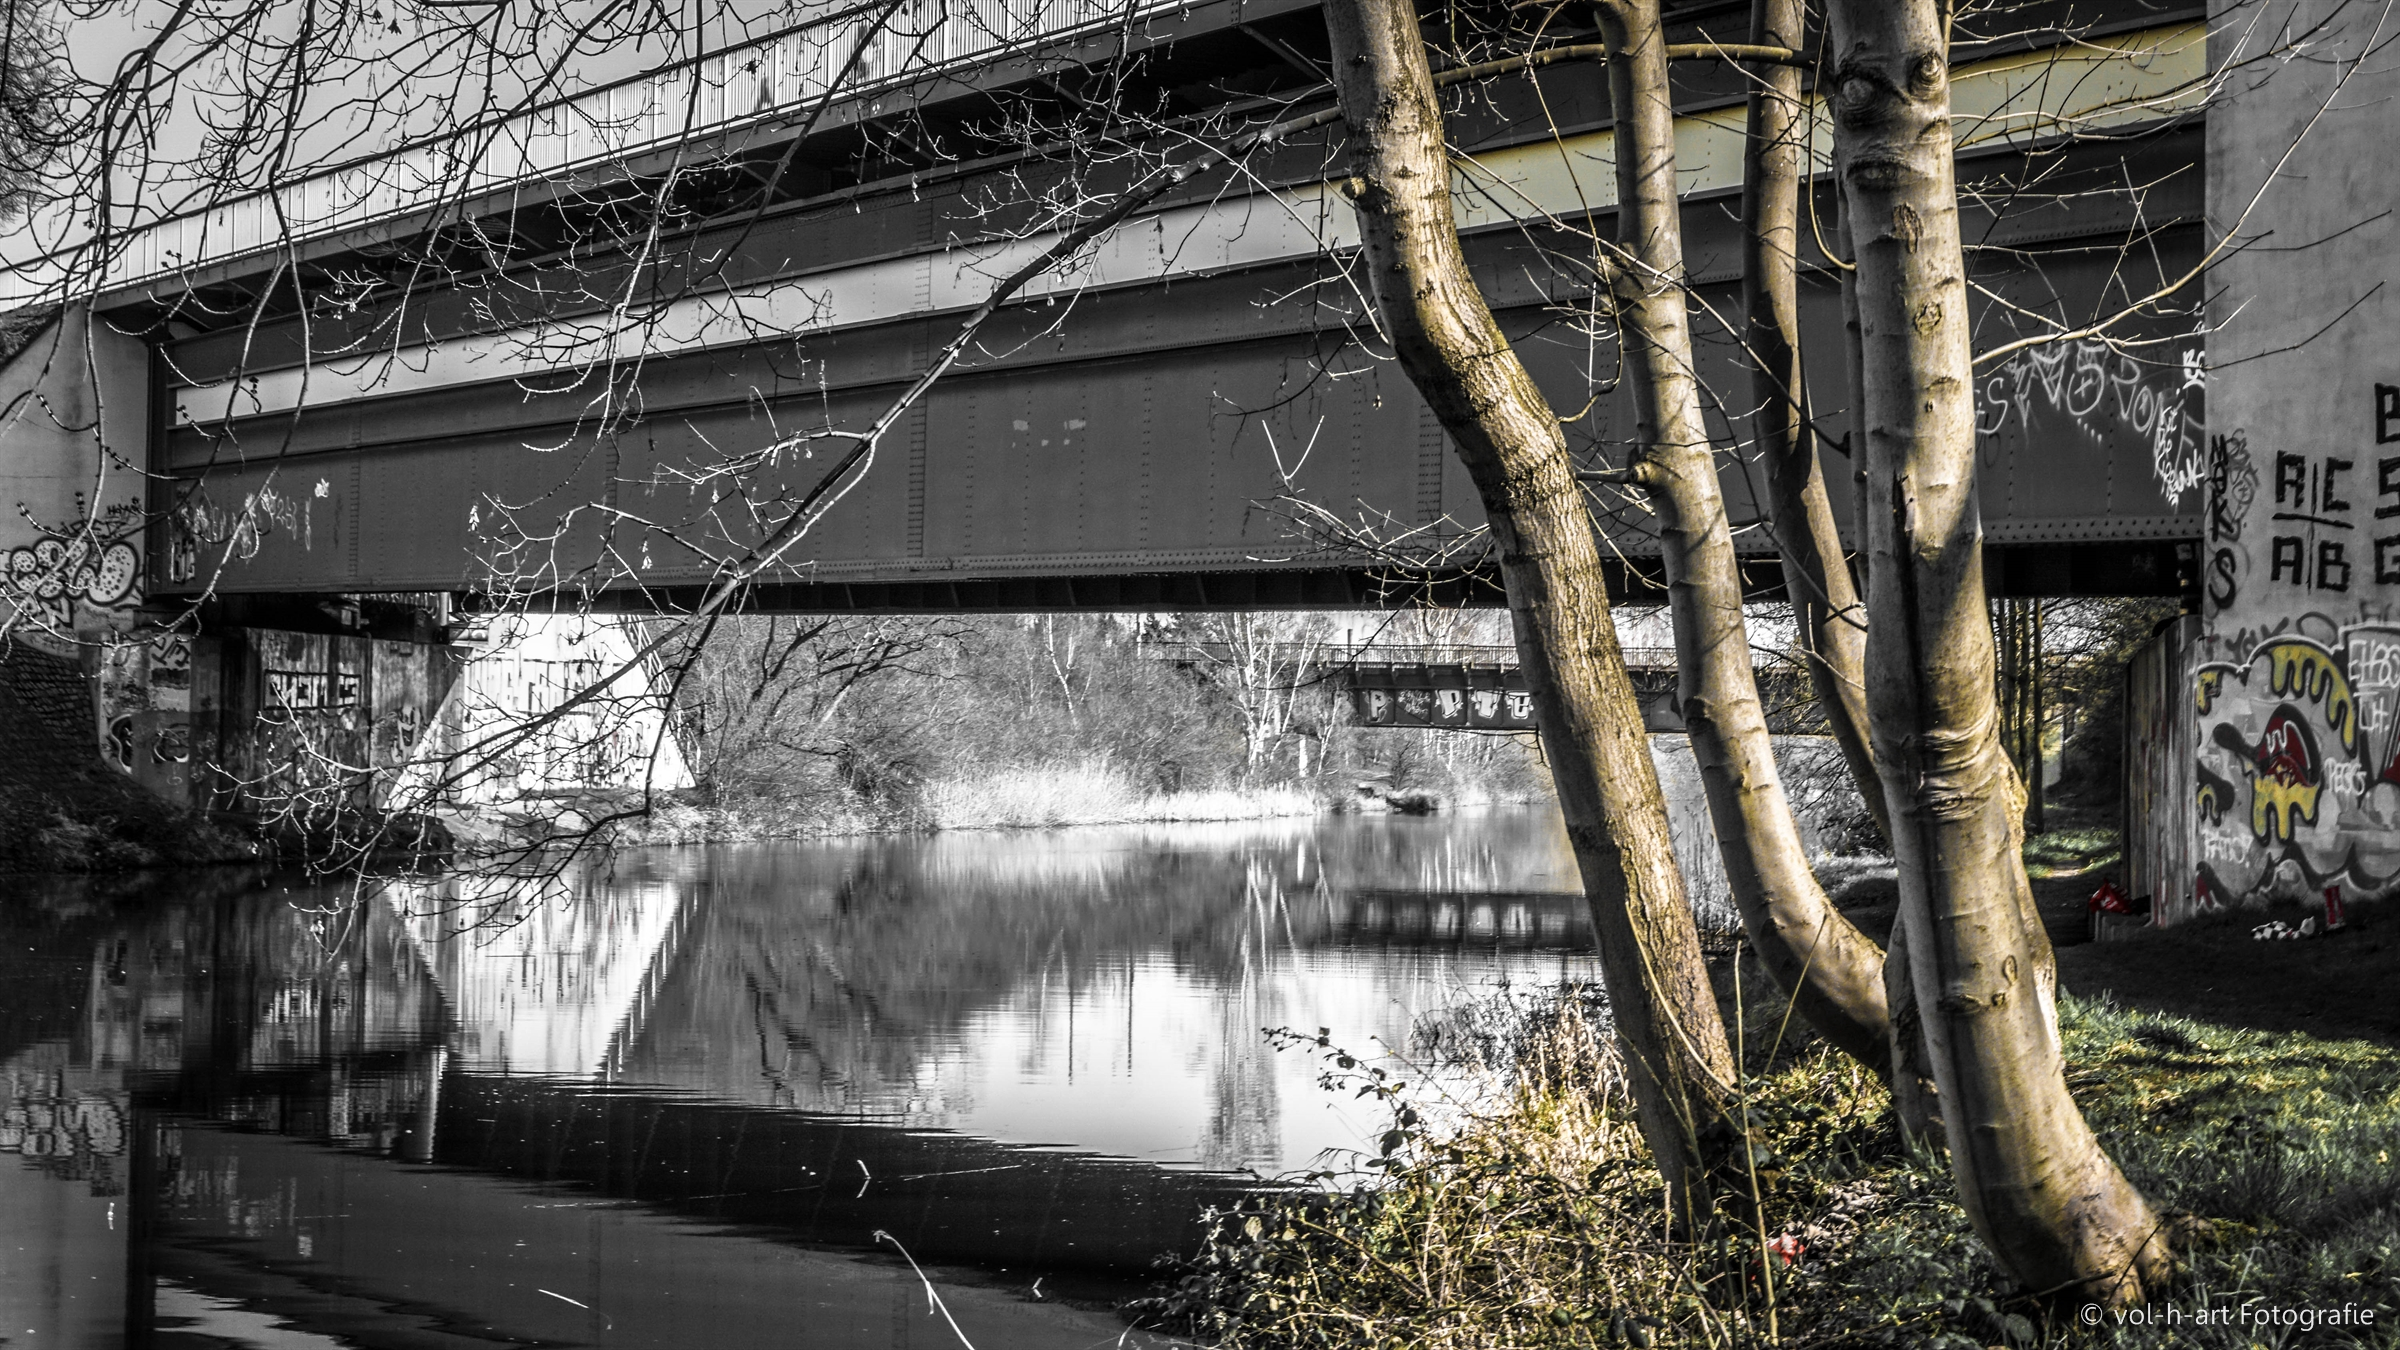 Elster-Saale-Kanal